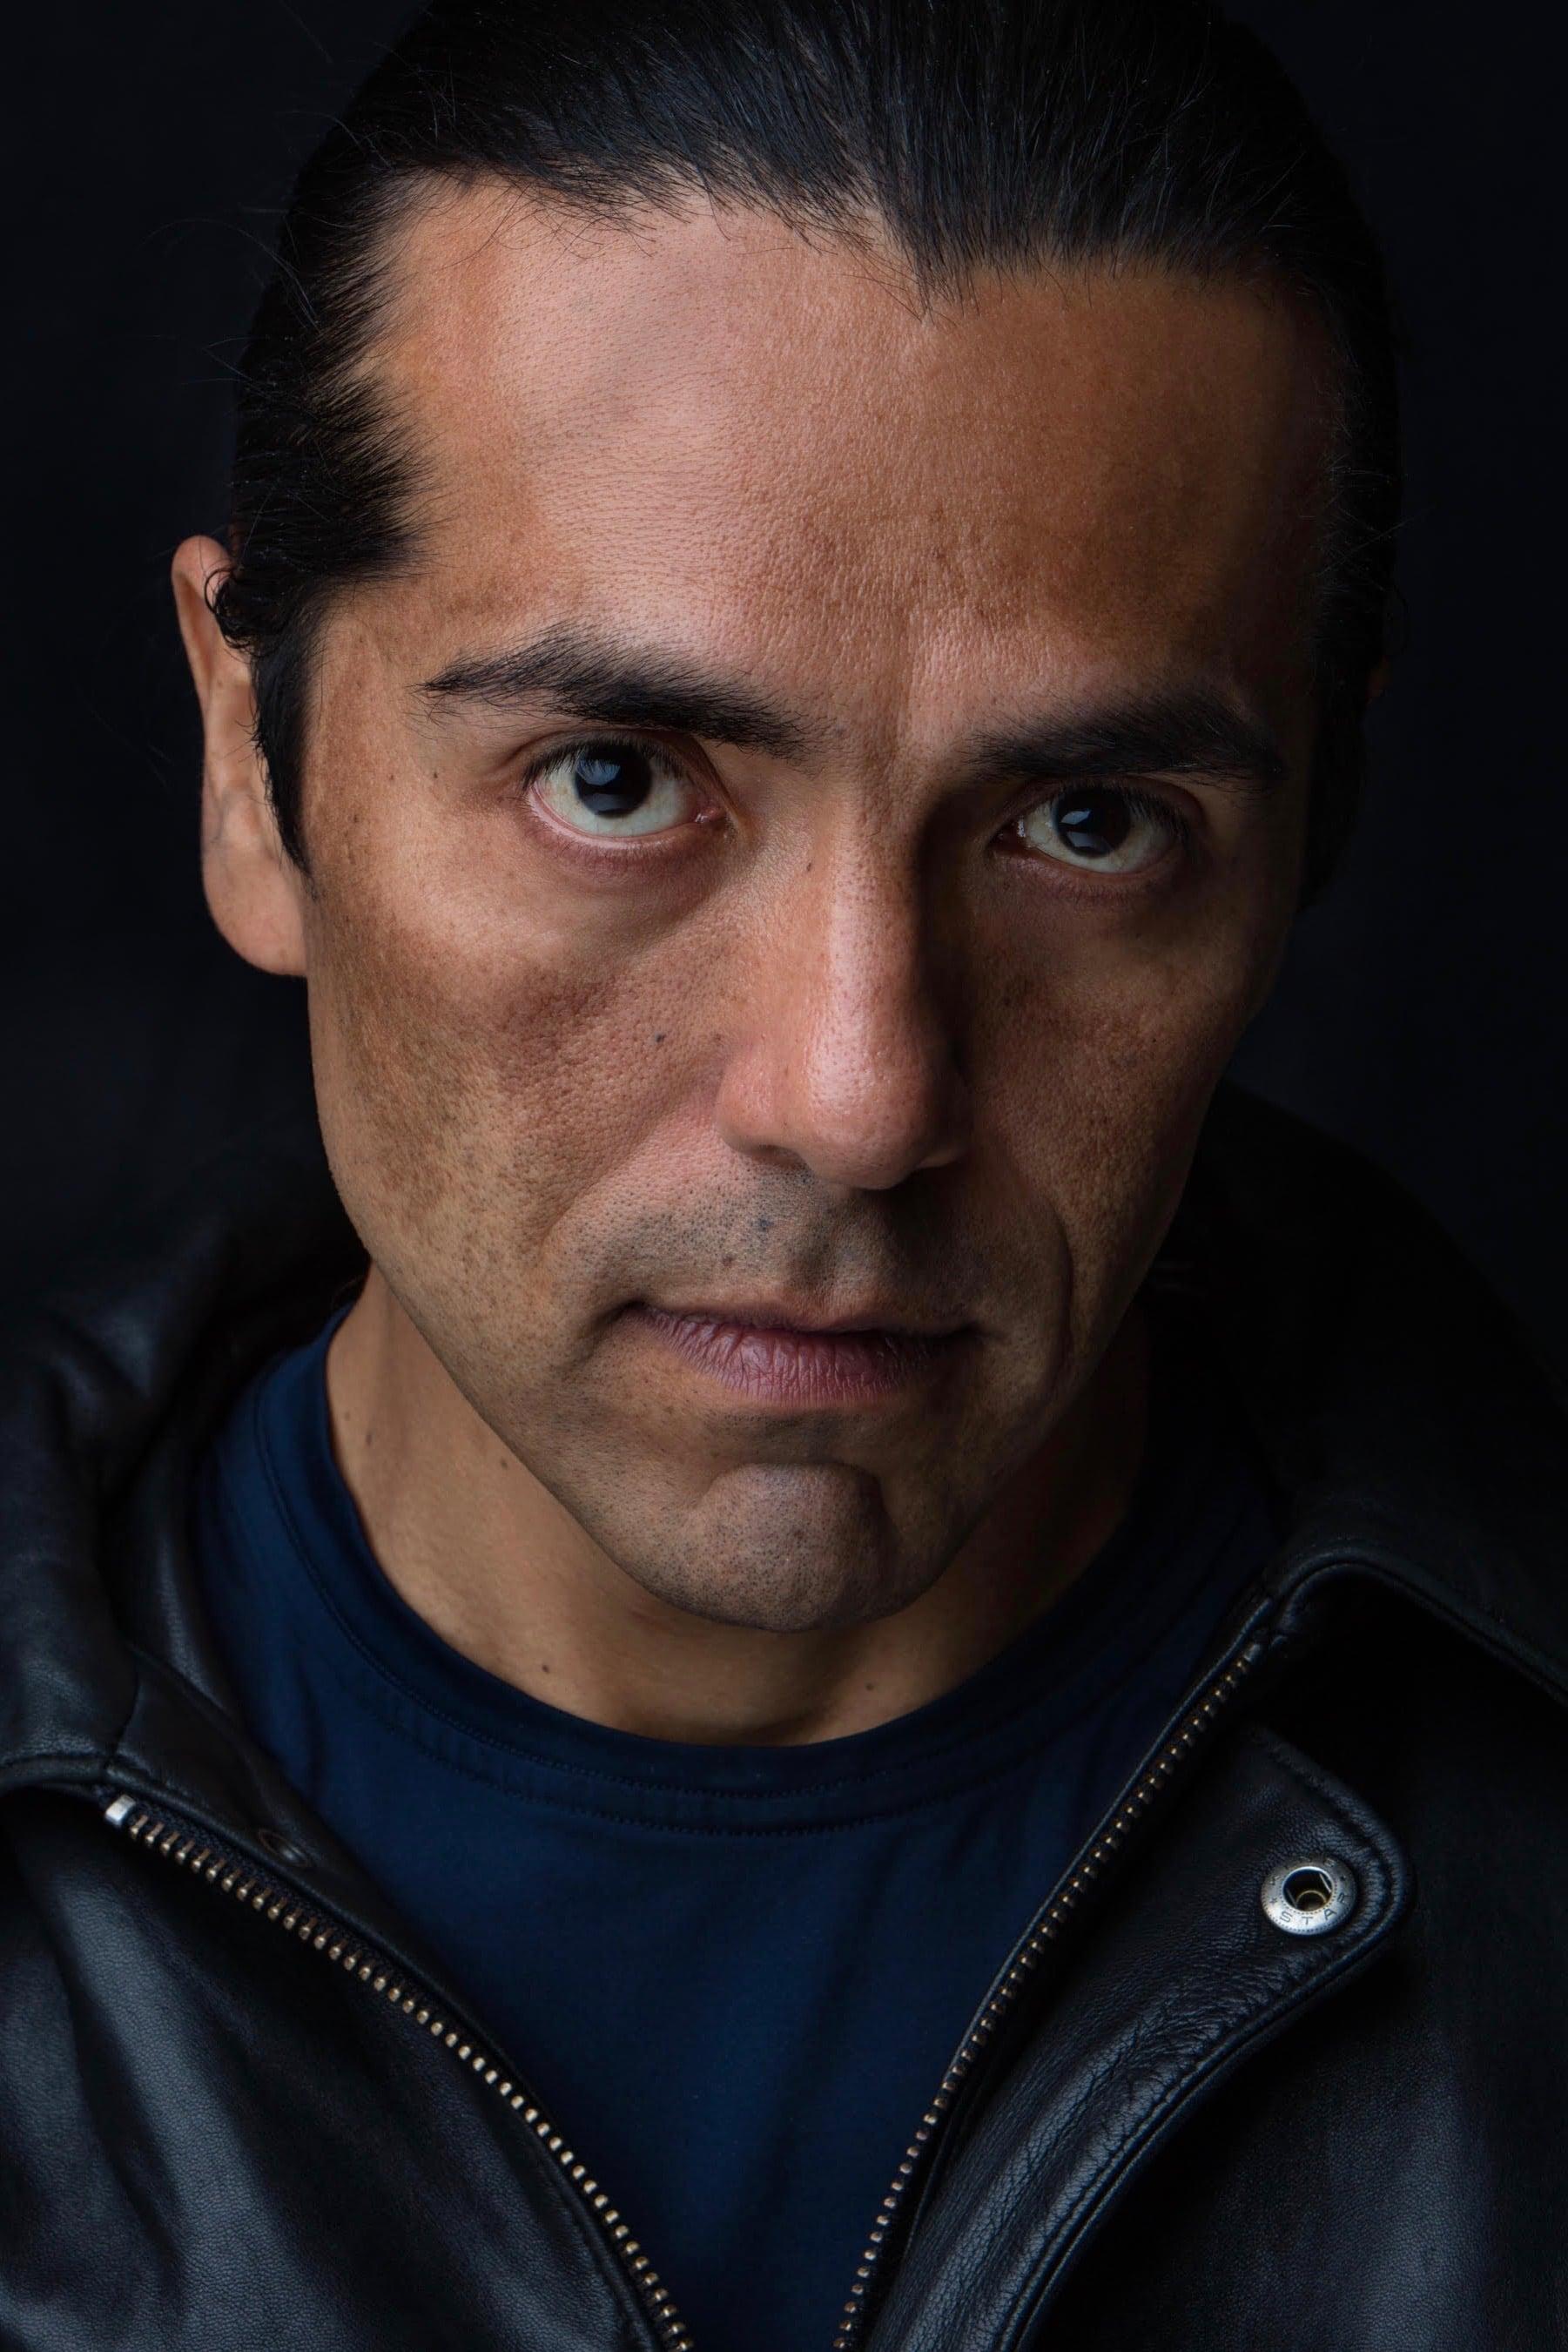 Raúl Cardona